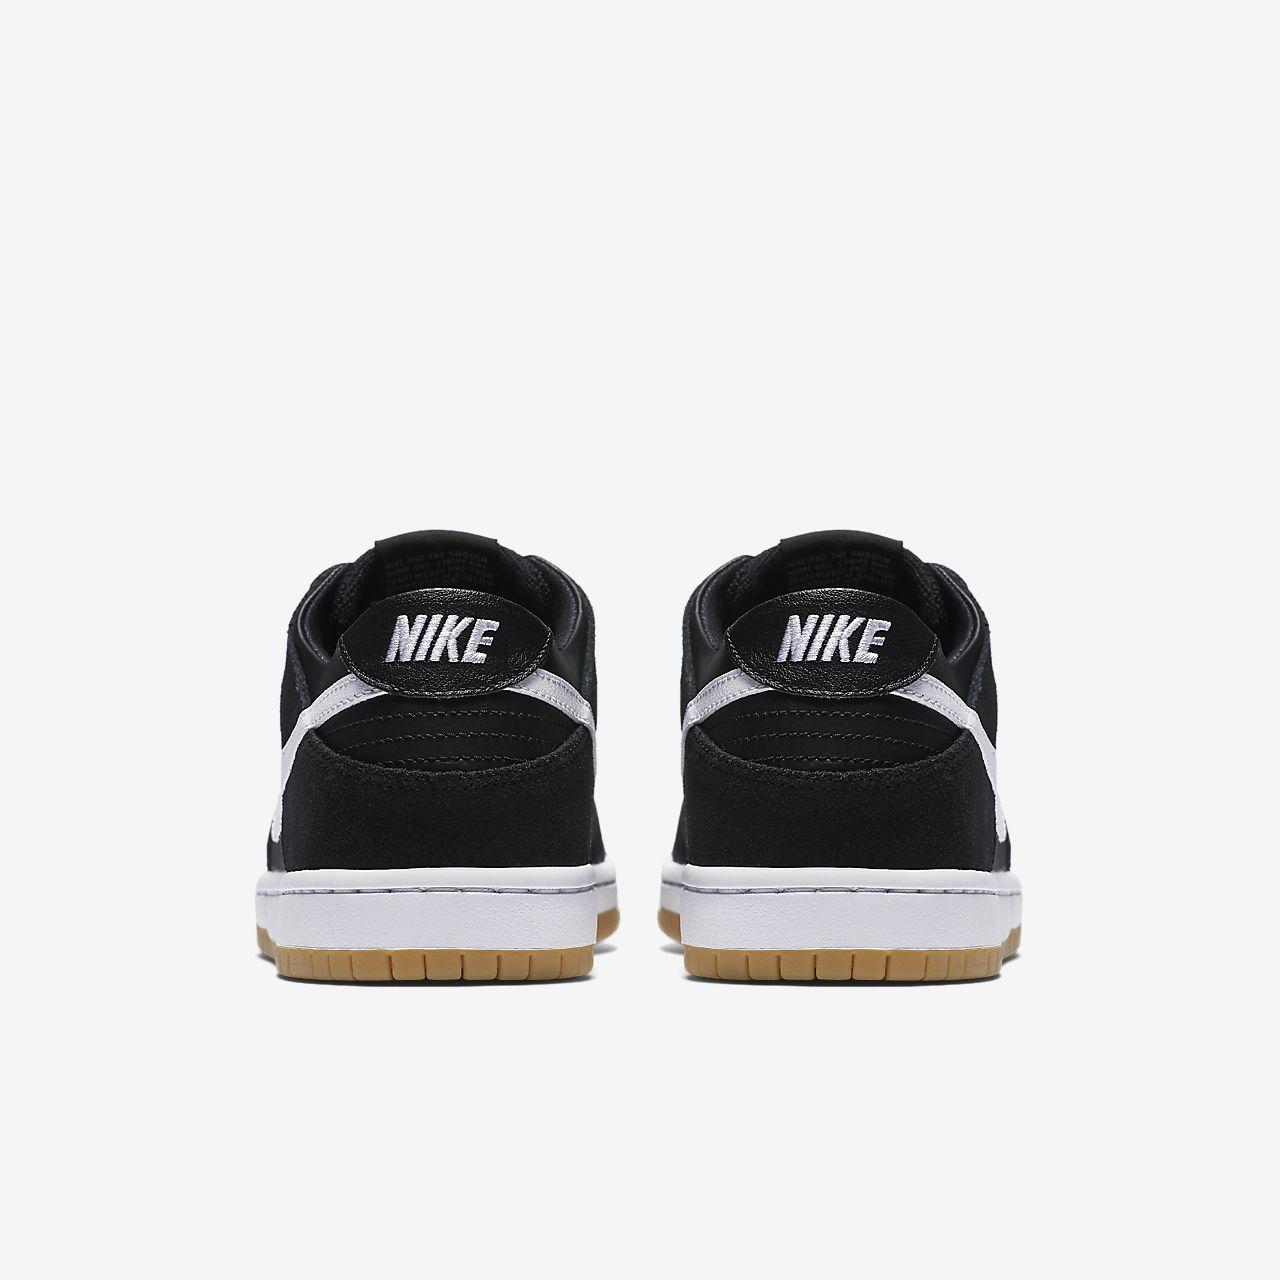 Nike dunk low lr black and white dresses